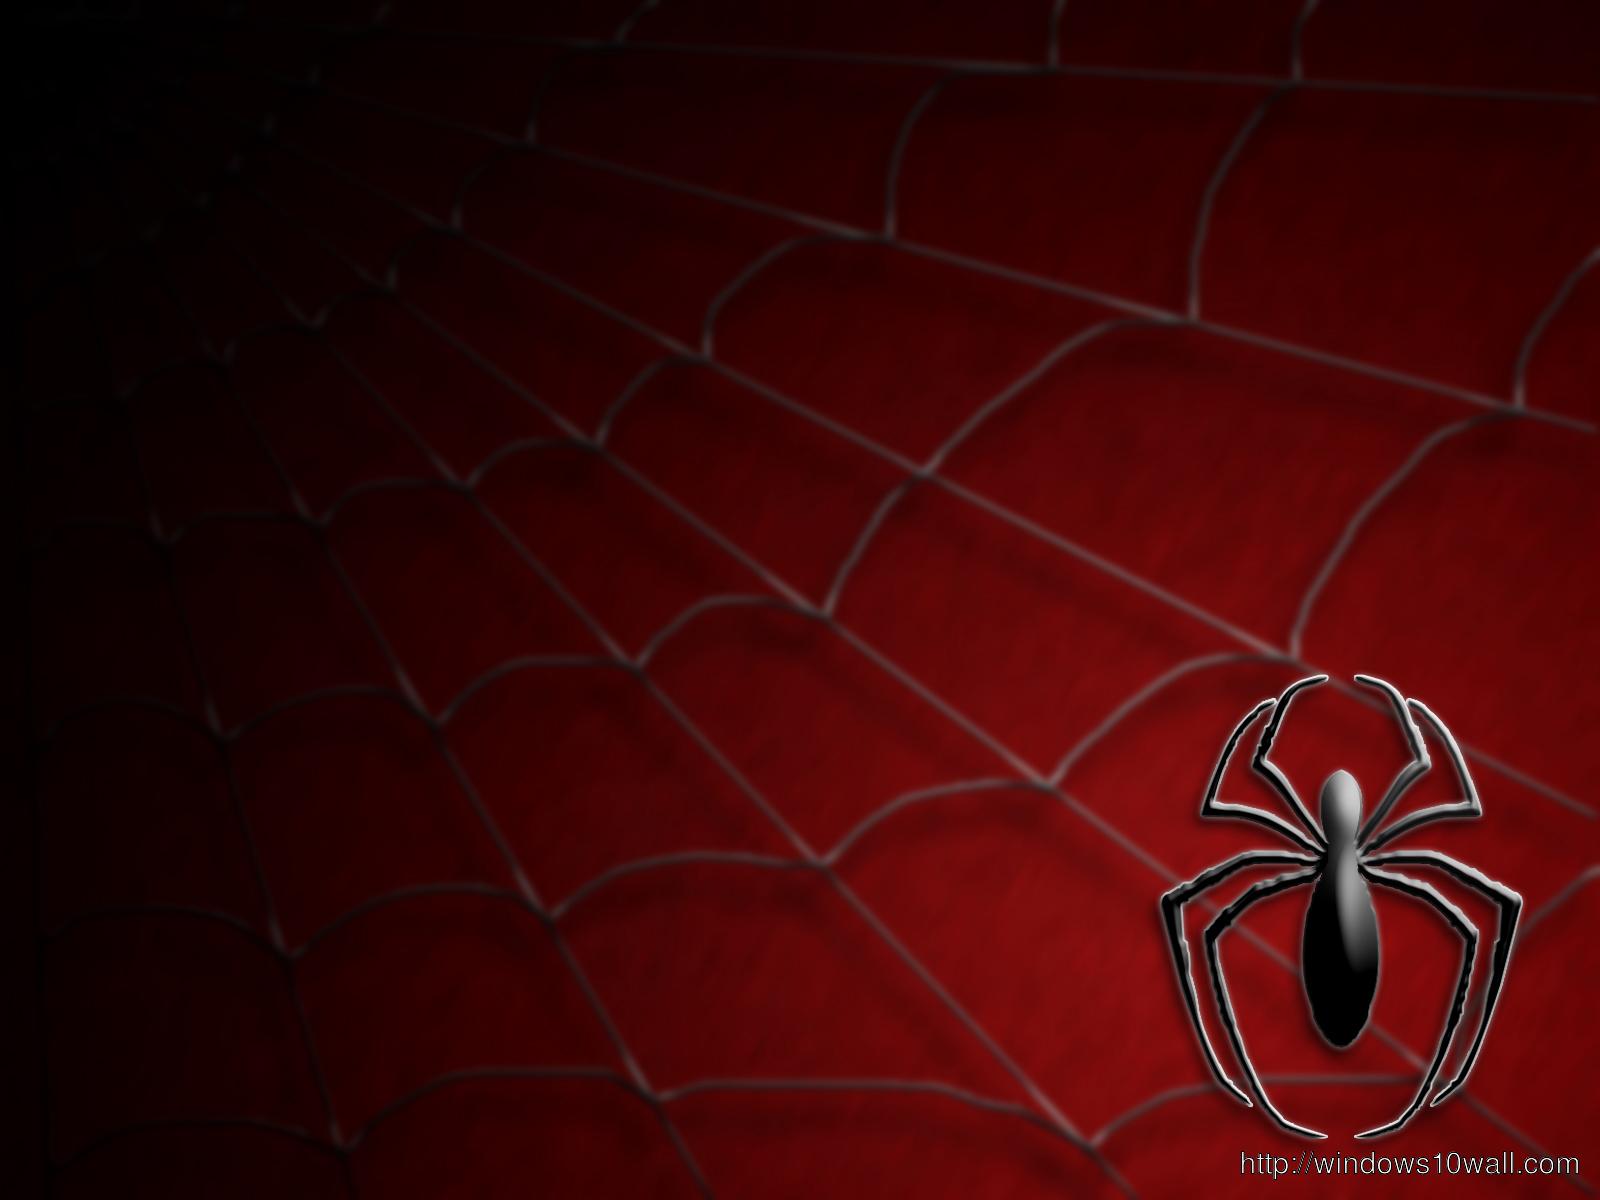 Spiderman Background Wallpaper Widescreen Windows 10 Wallpapers